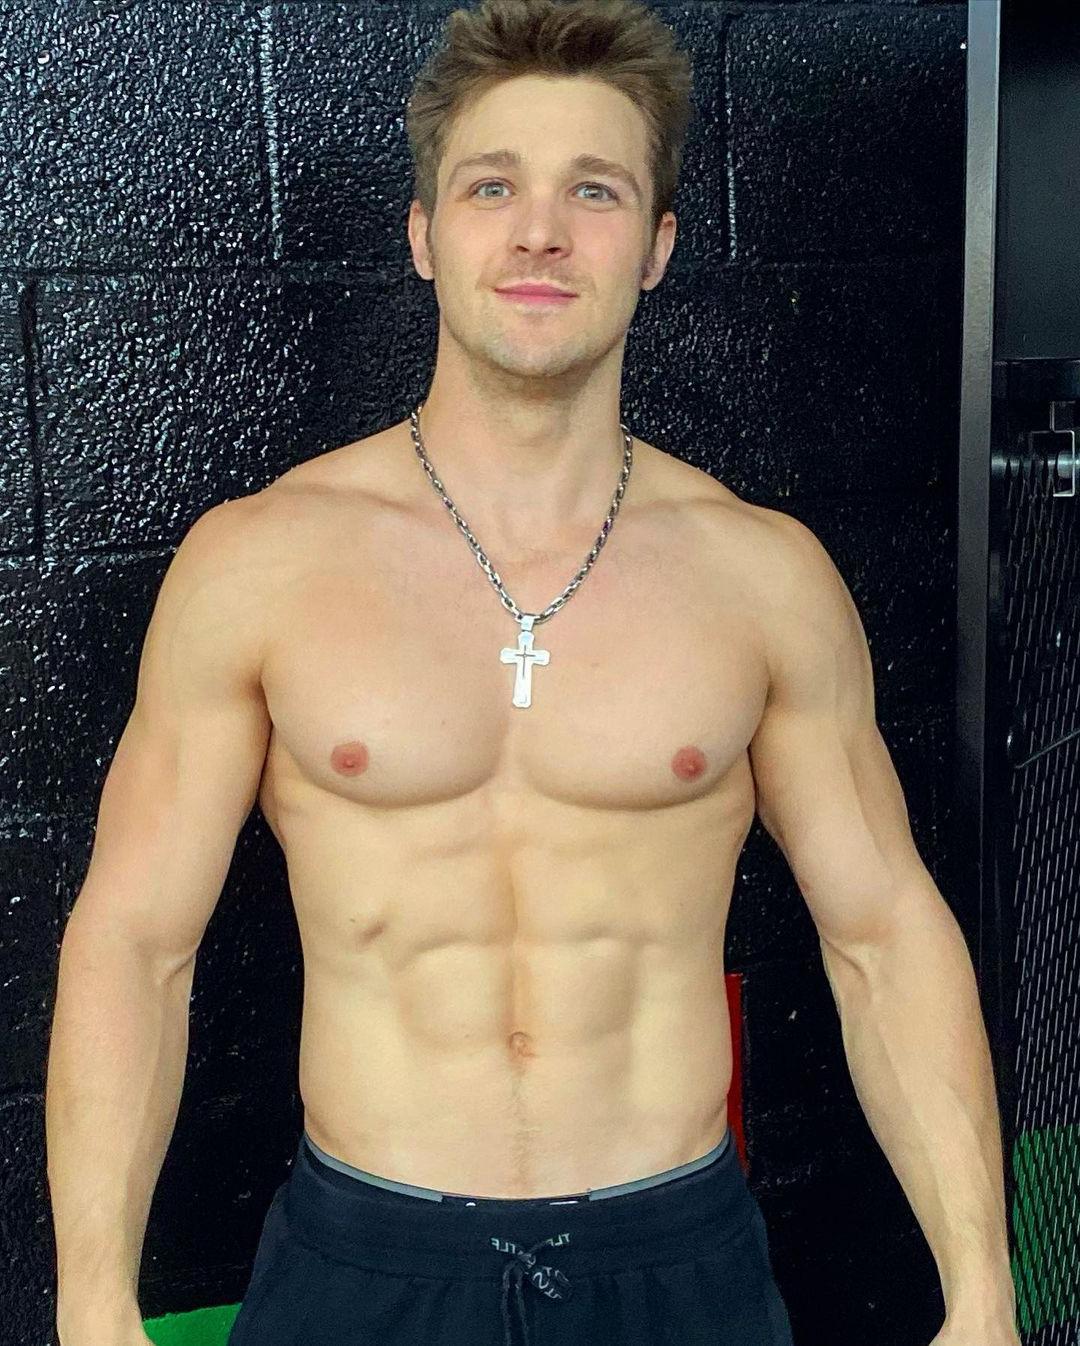 handsome-shirtless-men-smiling-cody-messner-abs-pecs